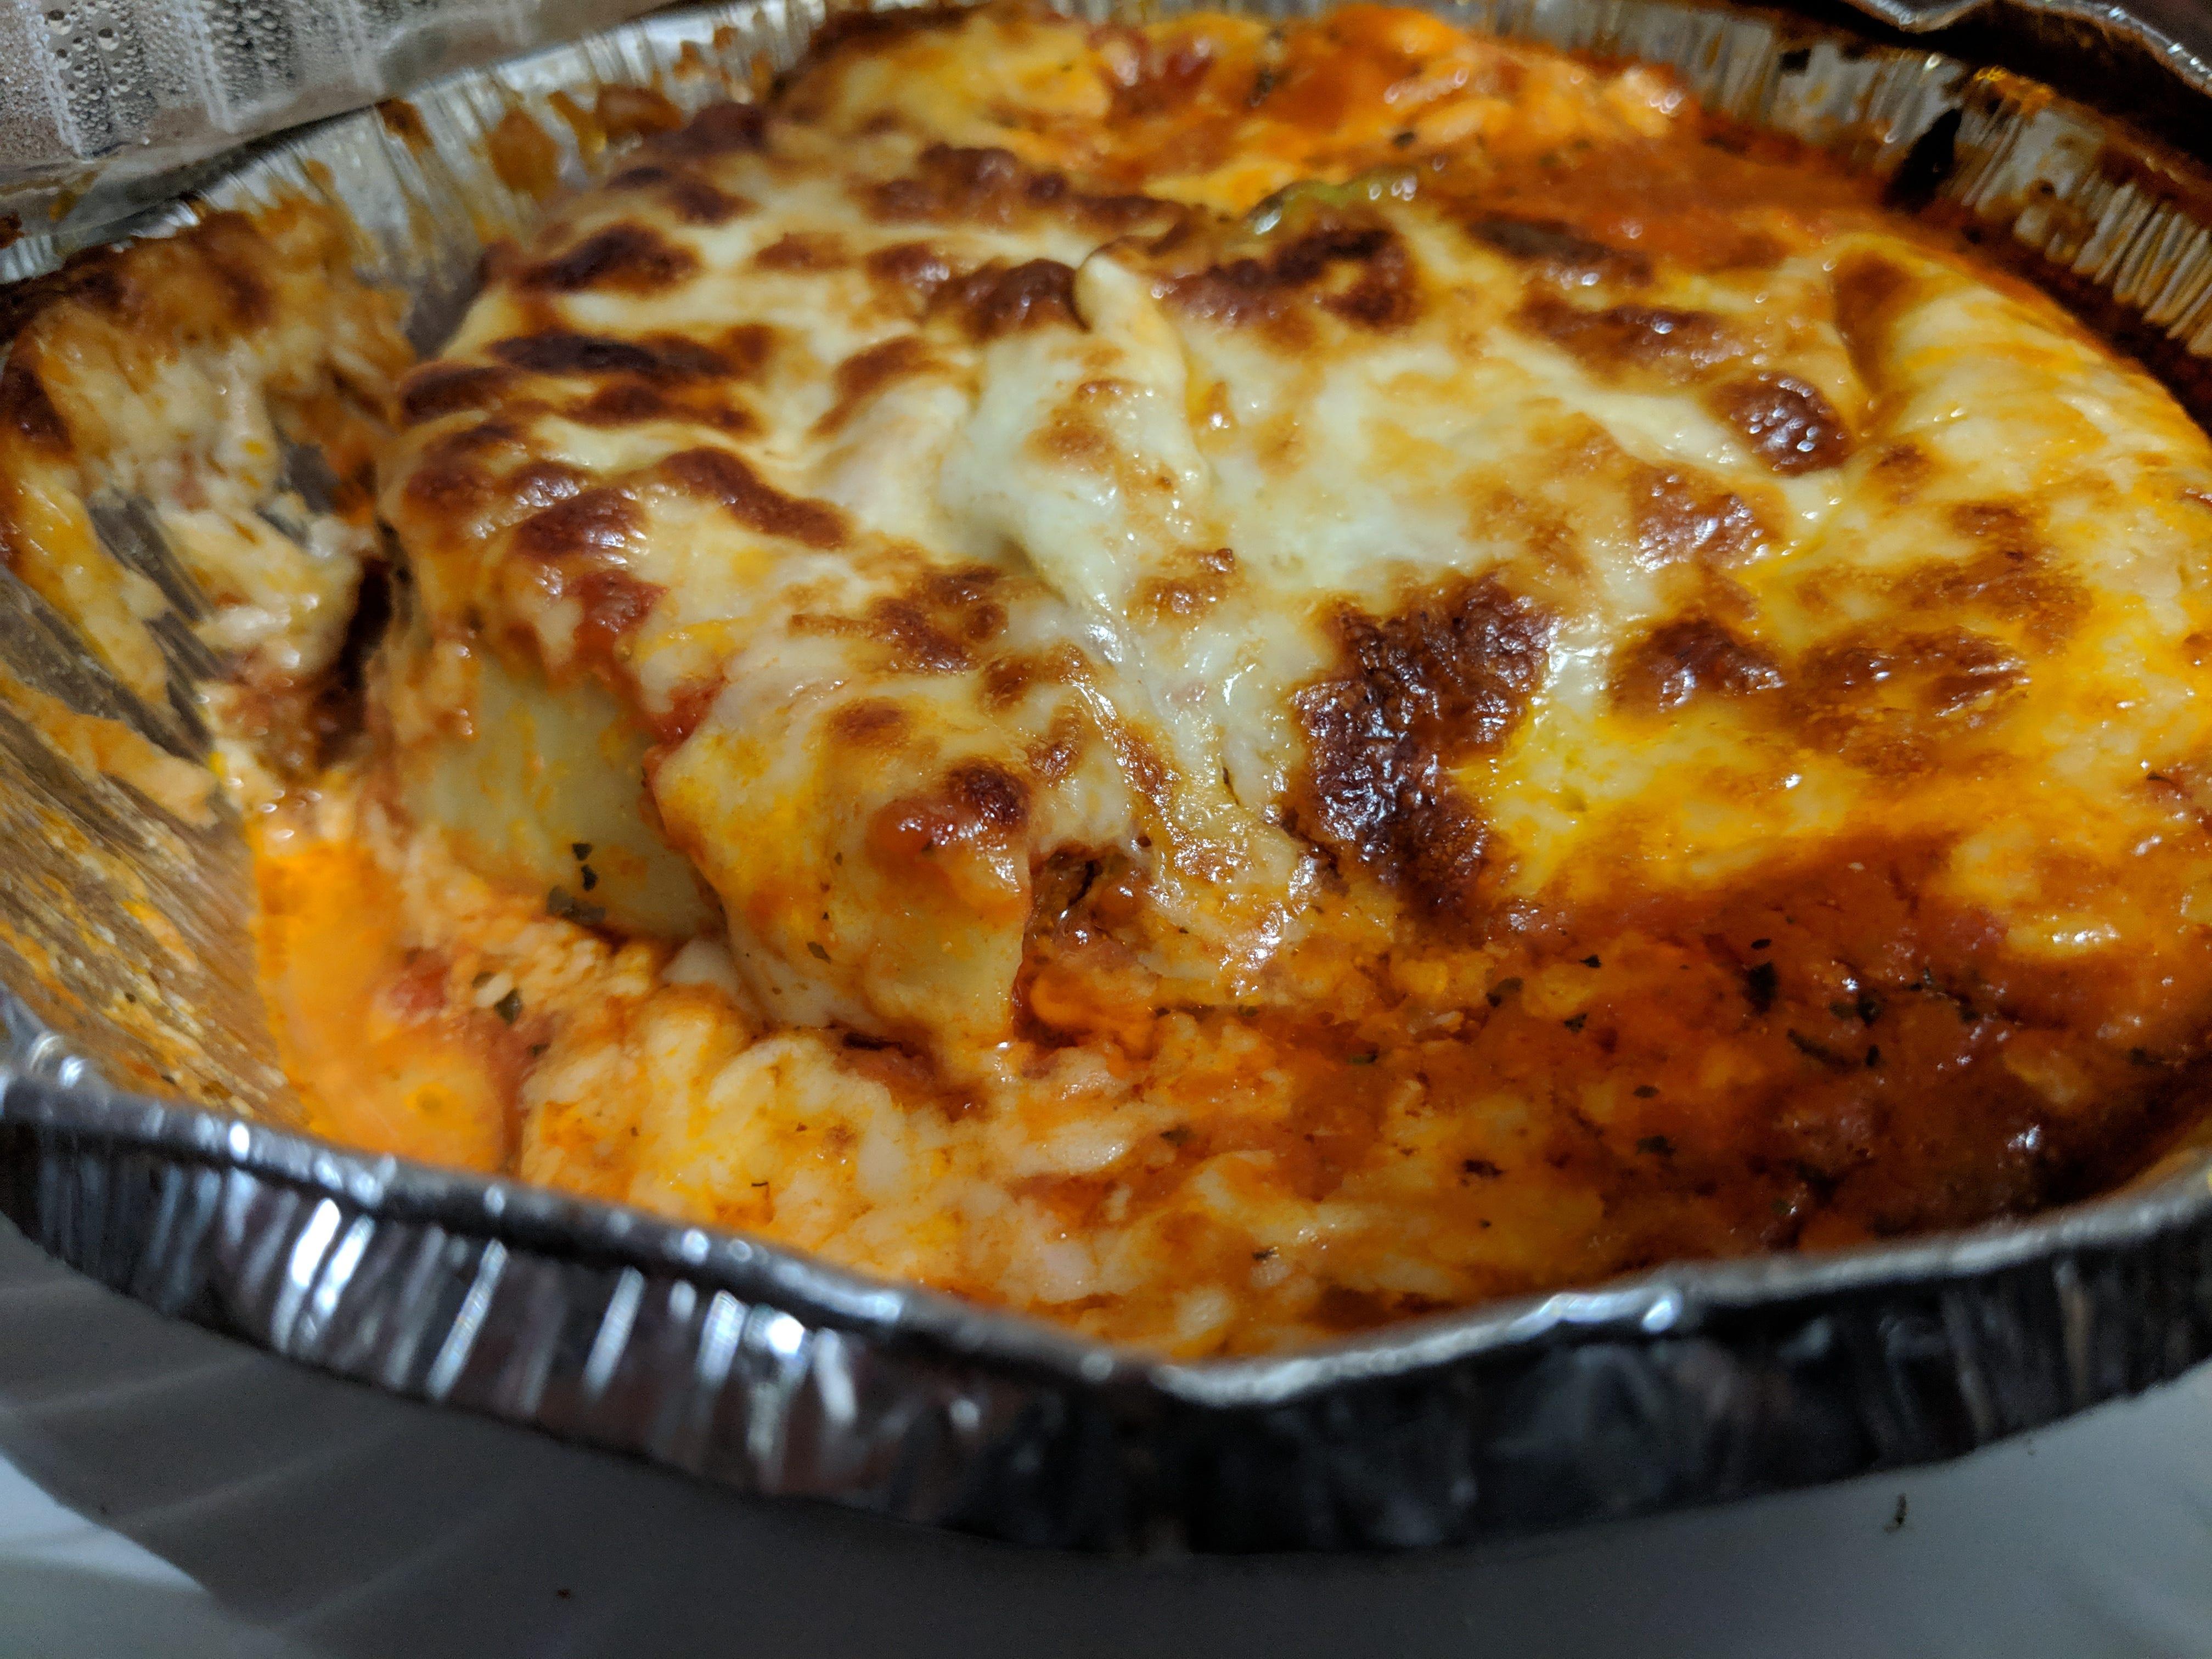 Pasta sampler at Napoli's Italian Restaurant.